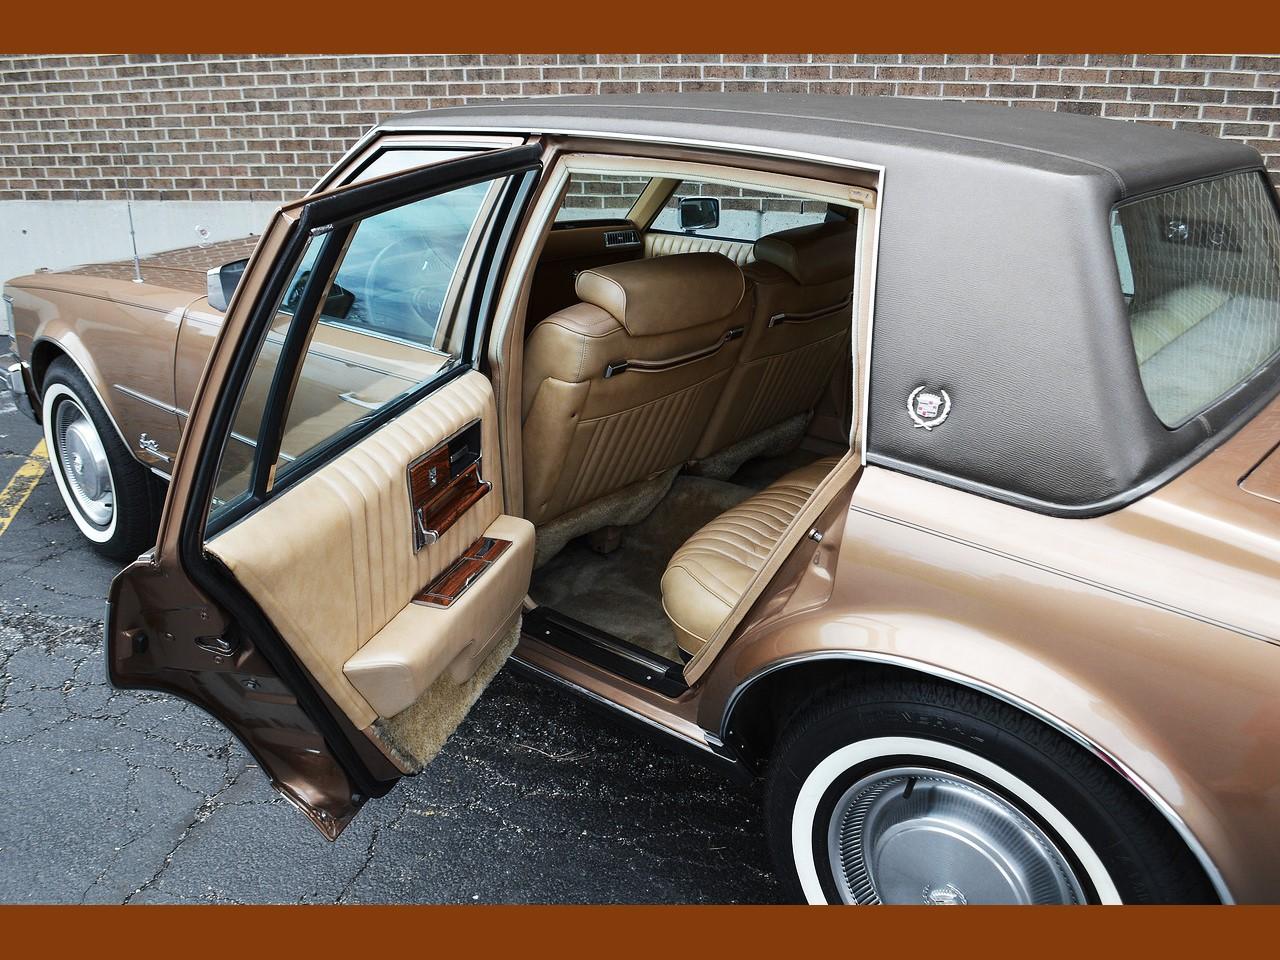 1976 Cadillac Seville 20